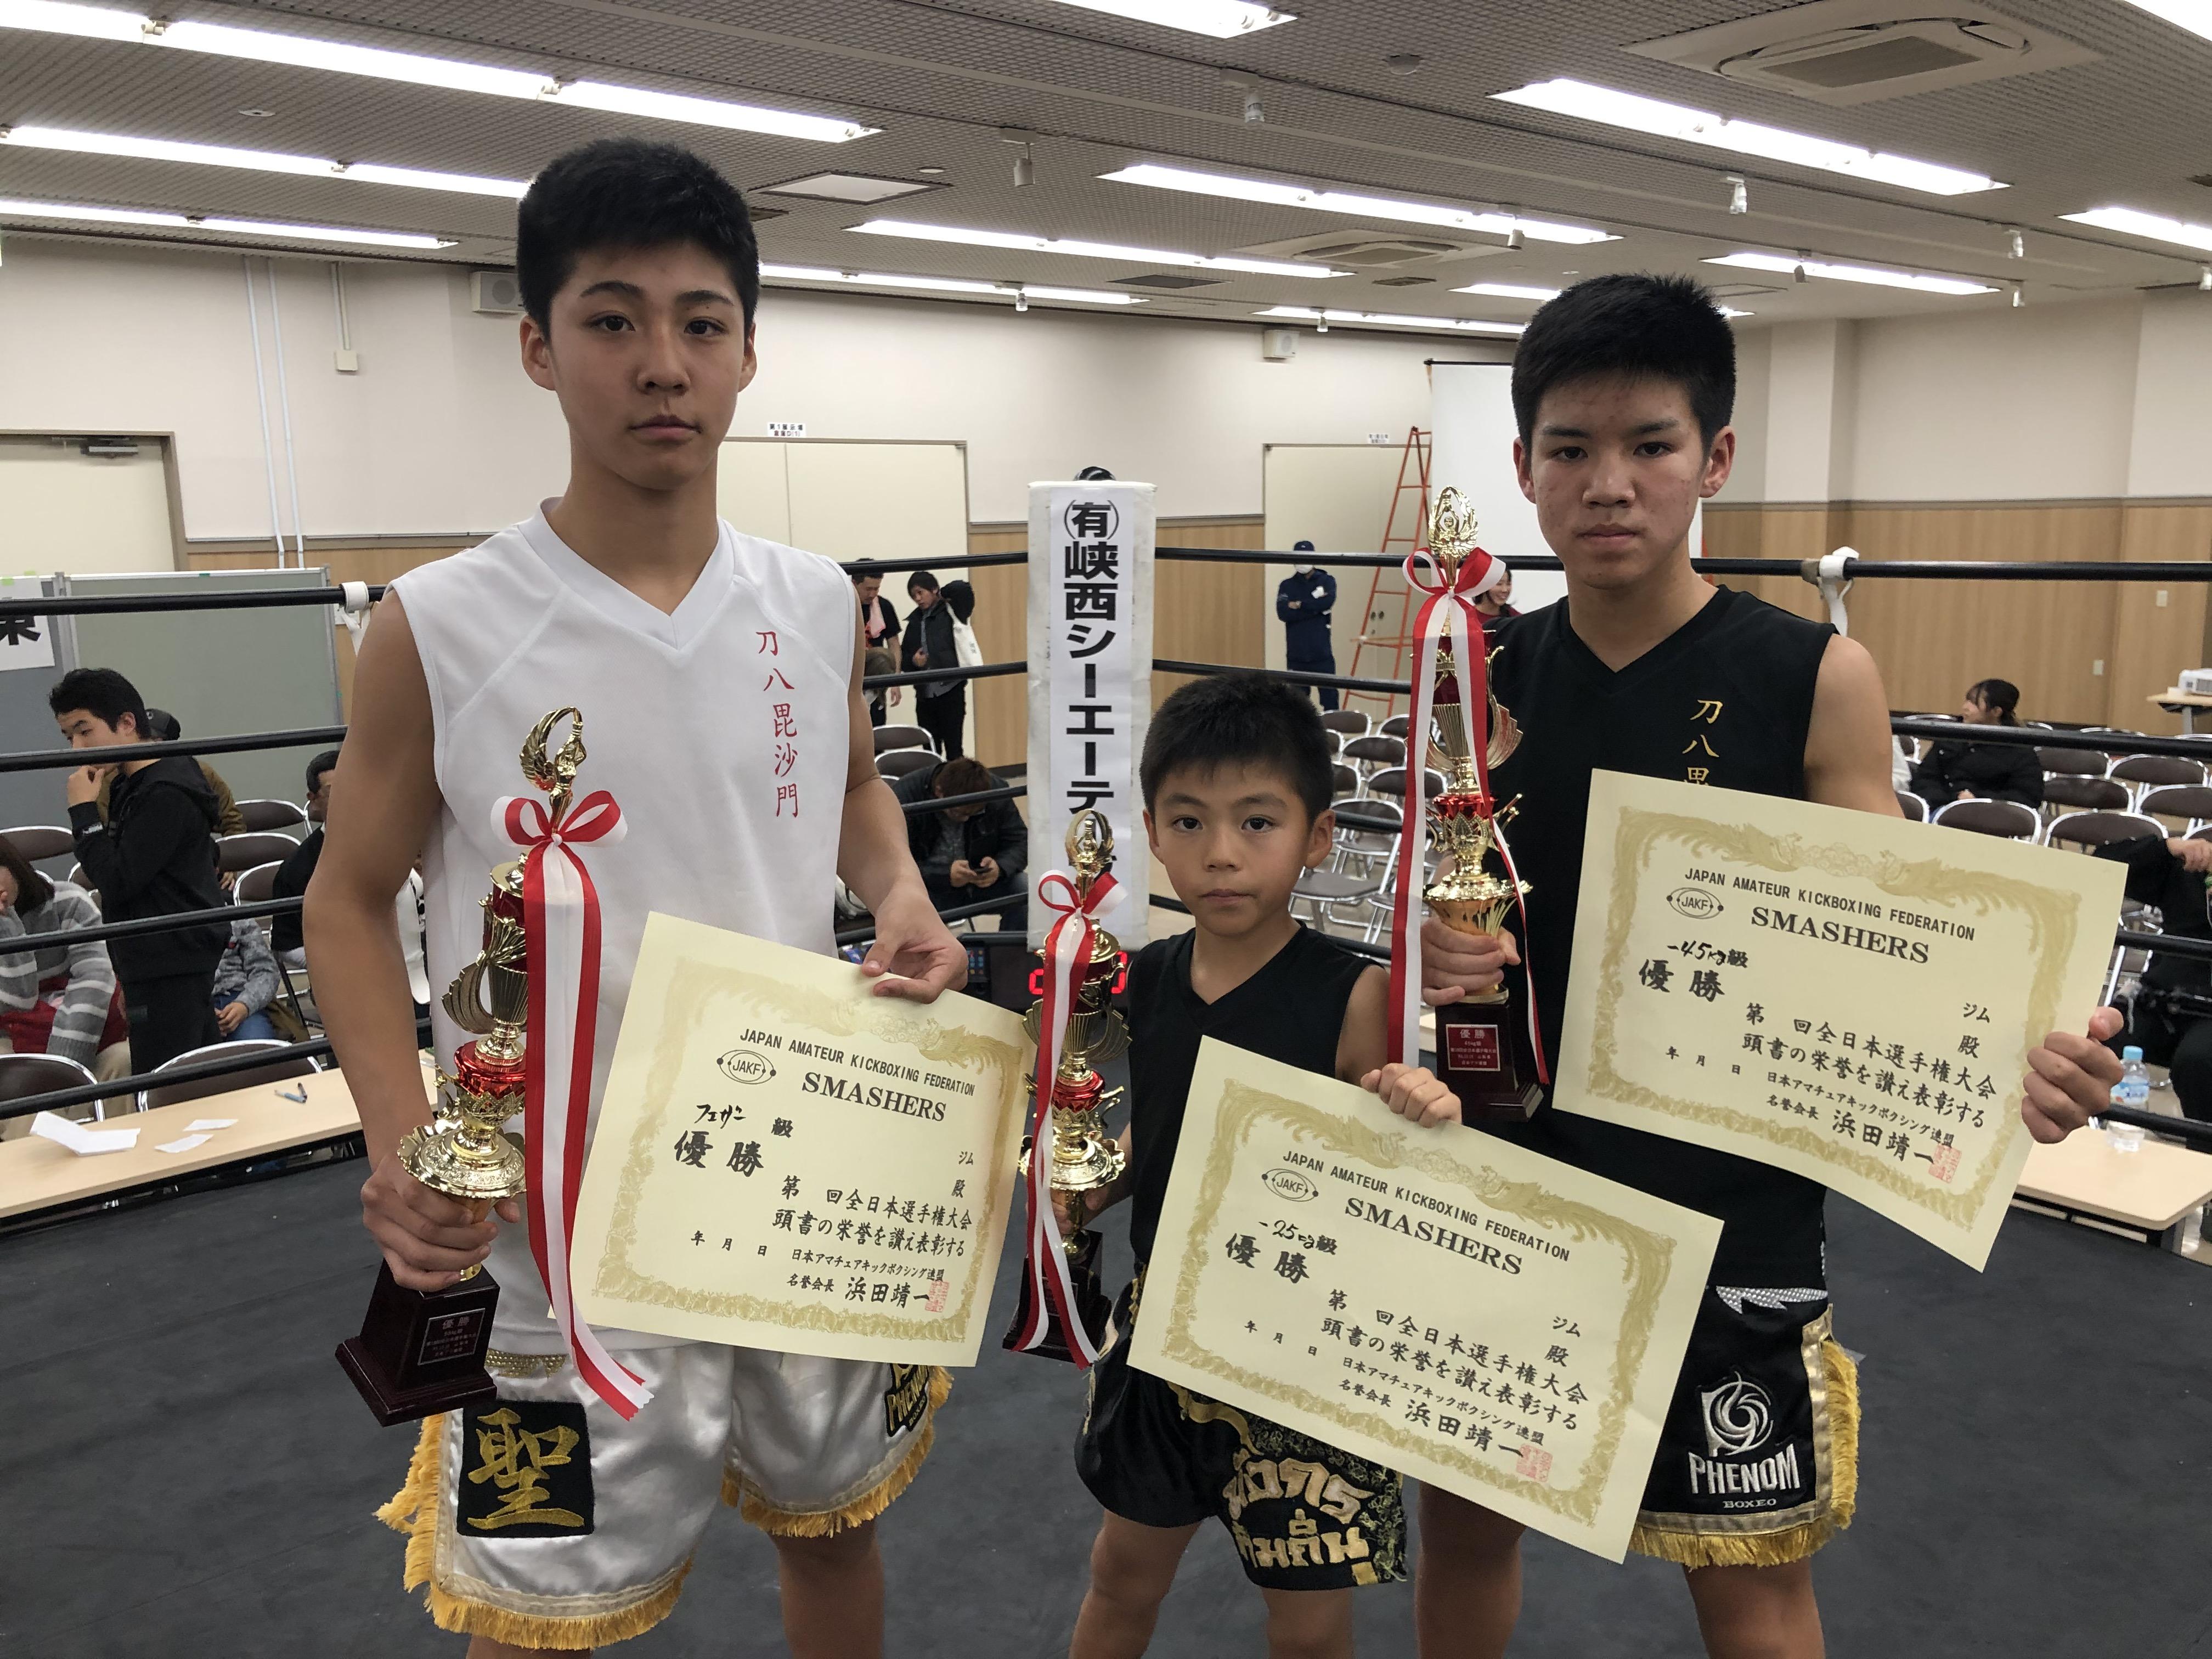 若原三兄弟、揃って全日本選手権優勝